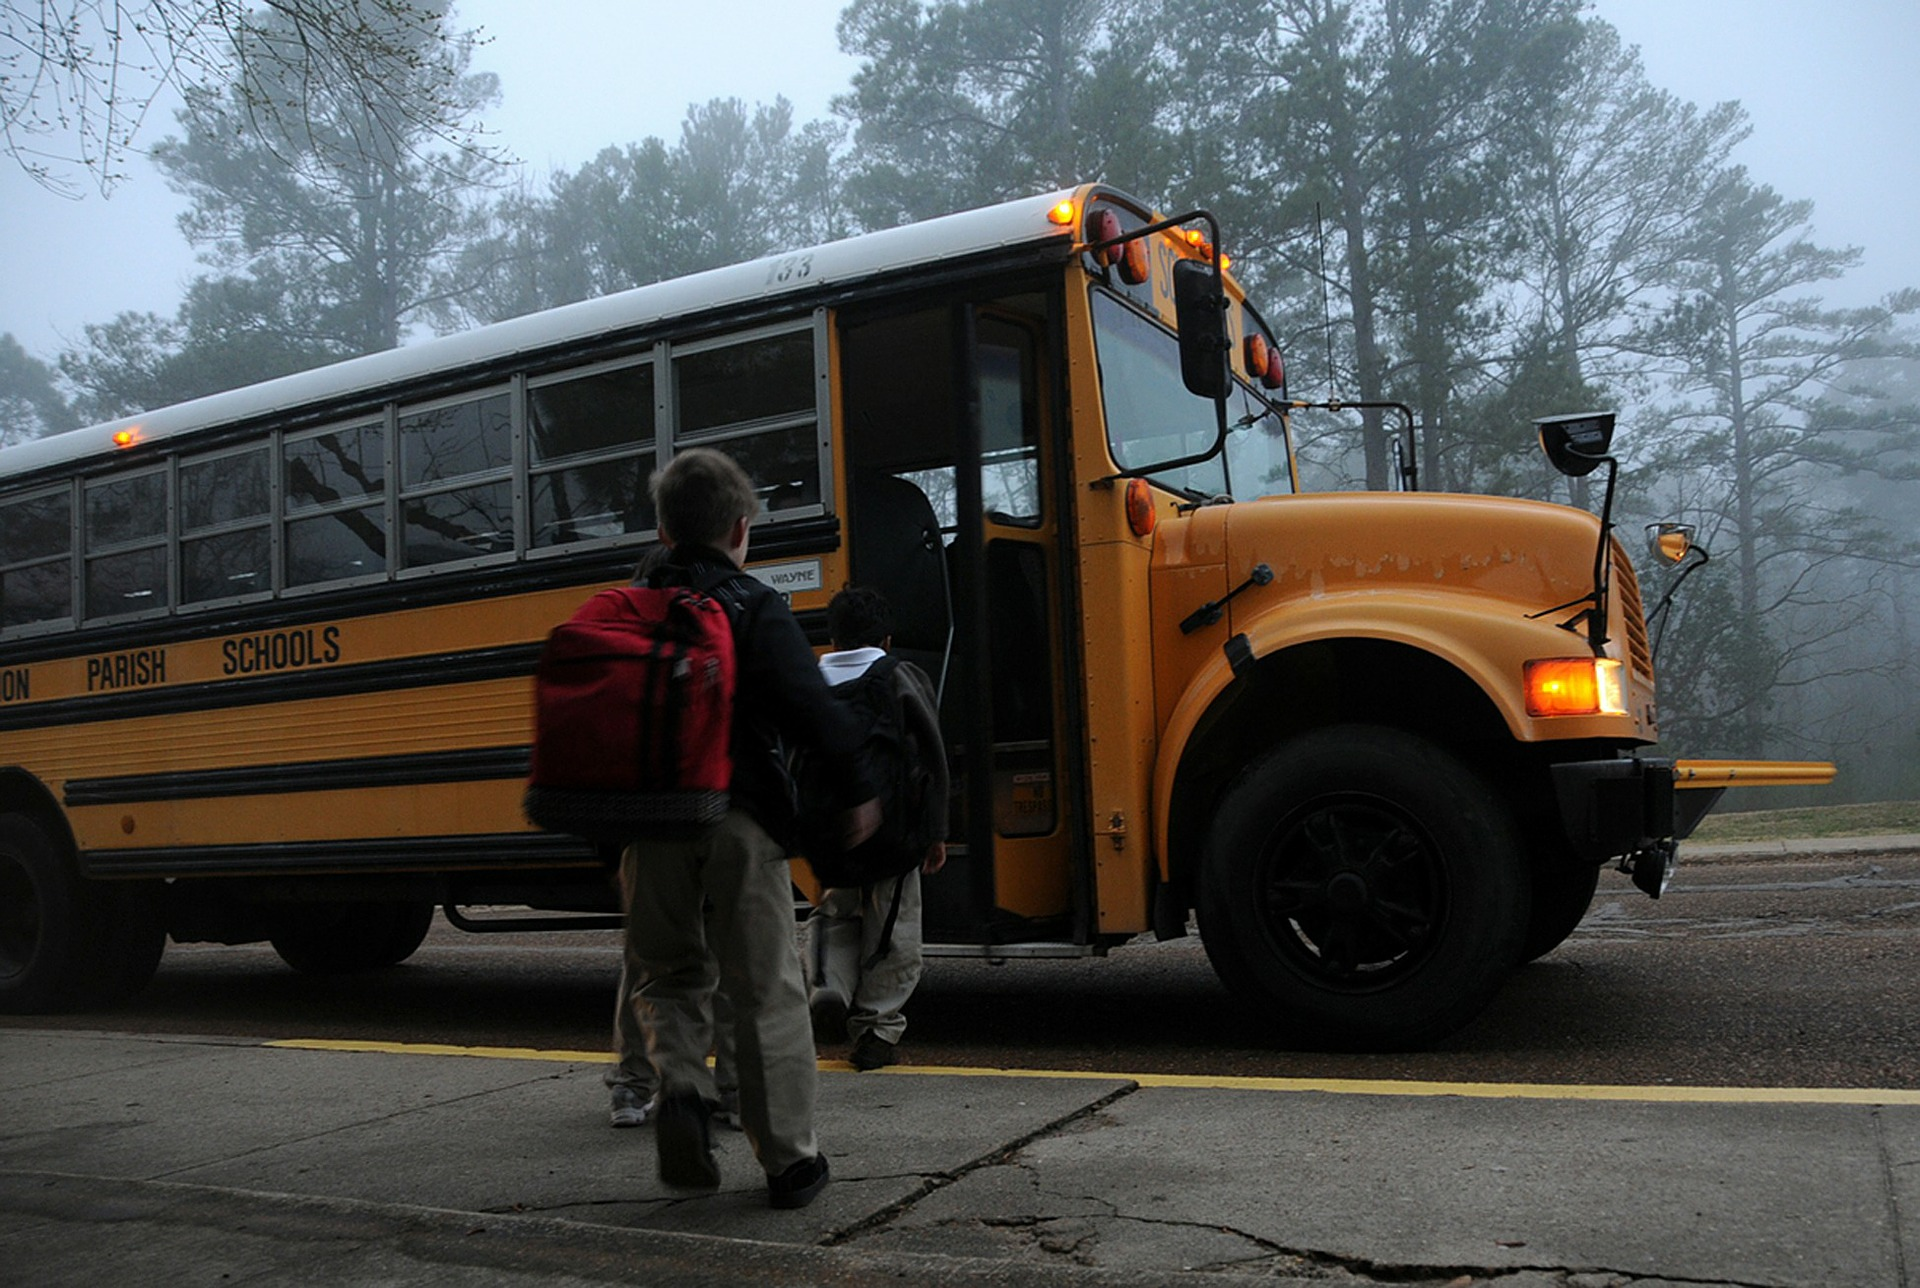 bus tracking, student tracking, school, gps, zenduit, bus eta